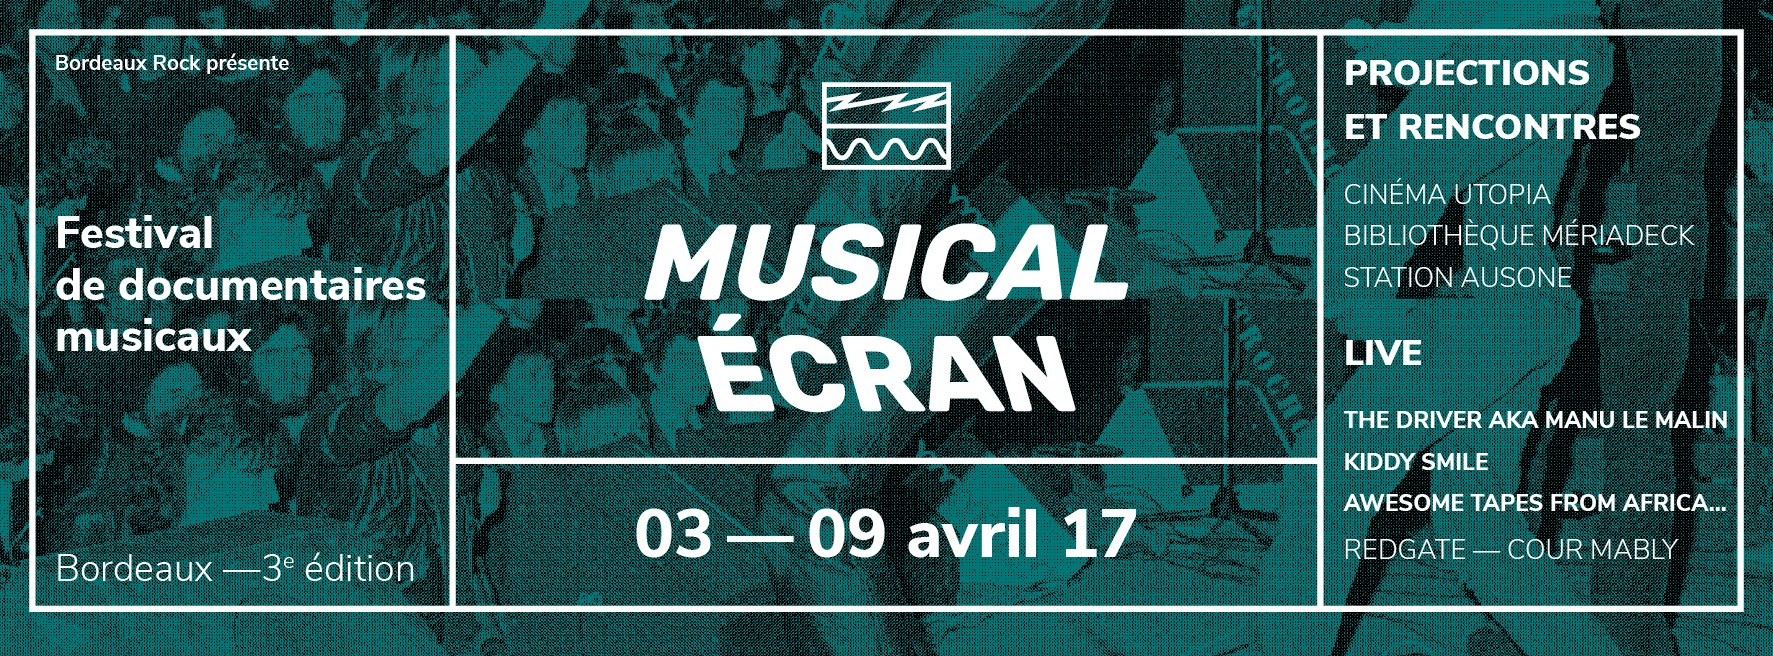 doc_musicaux